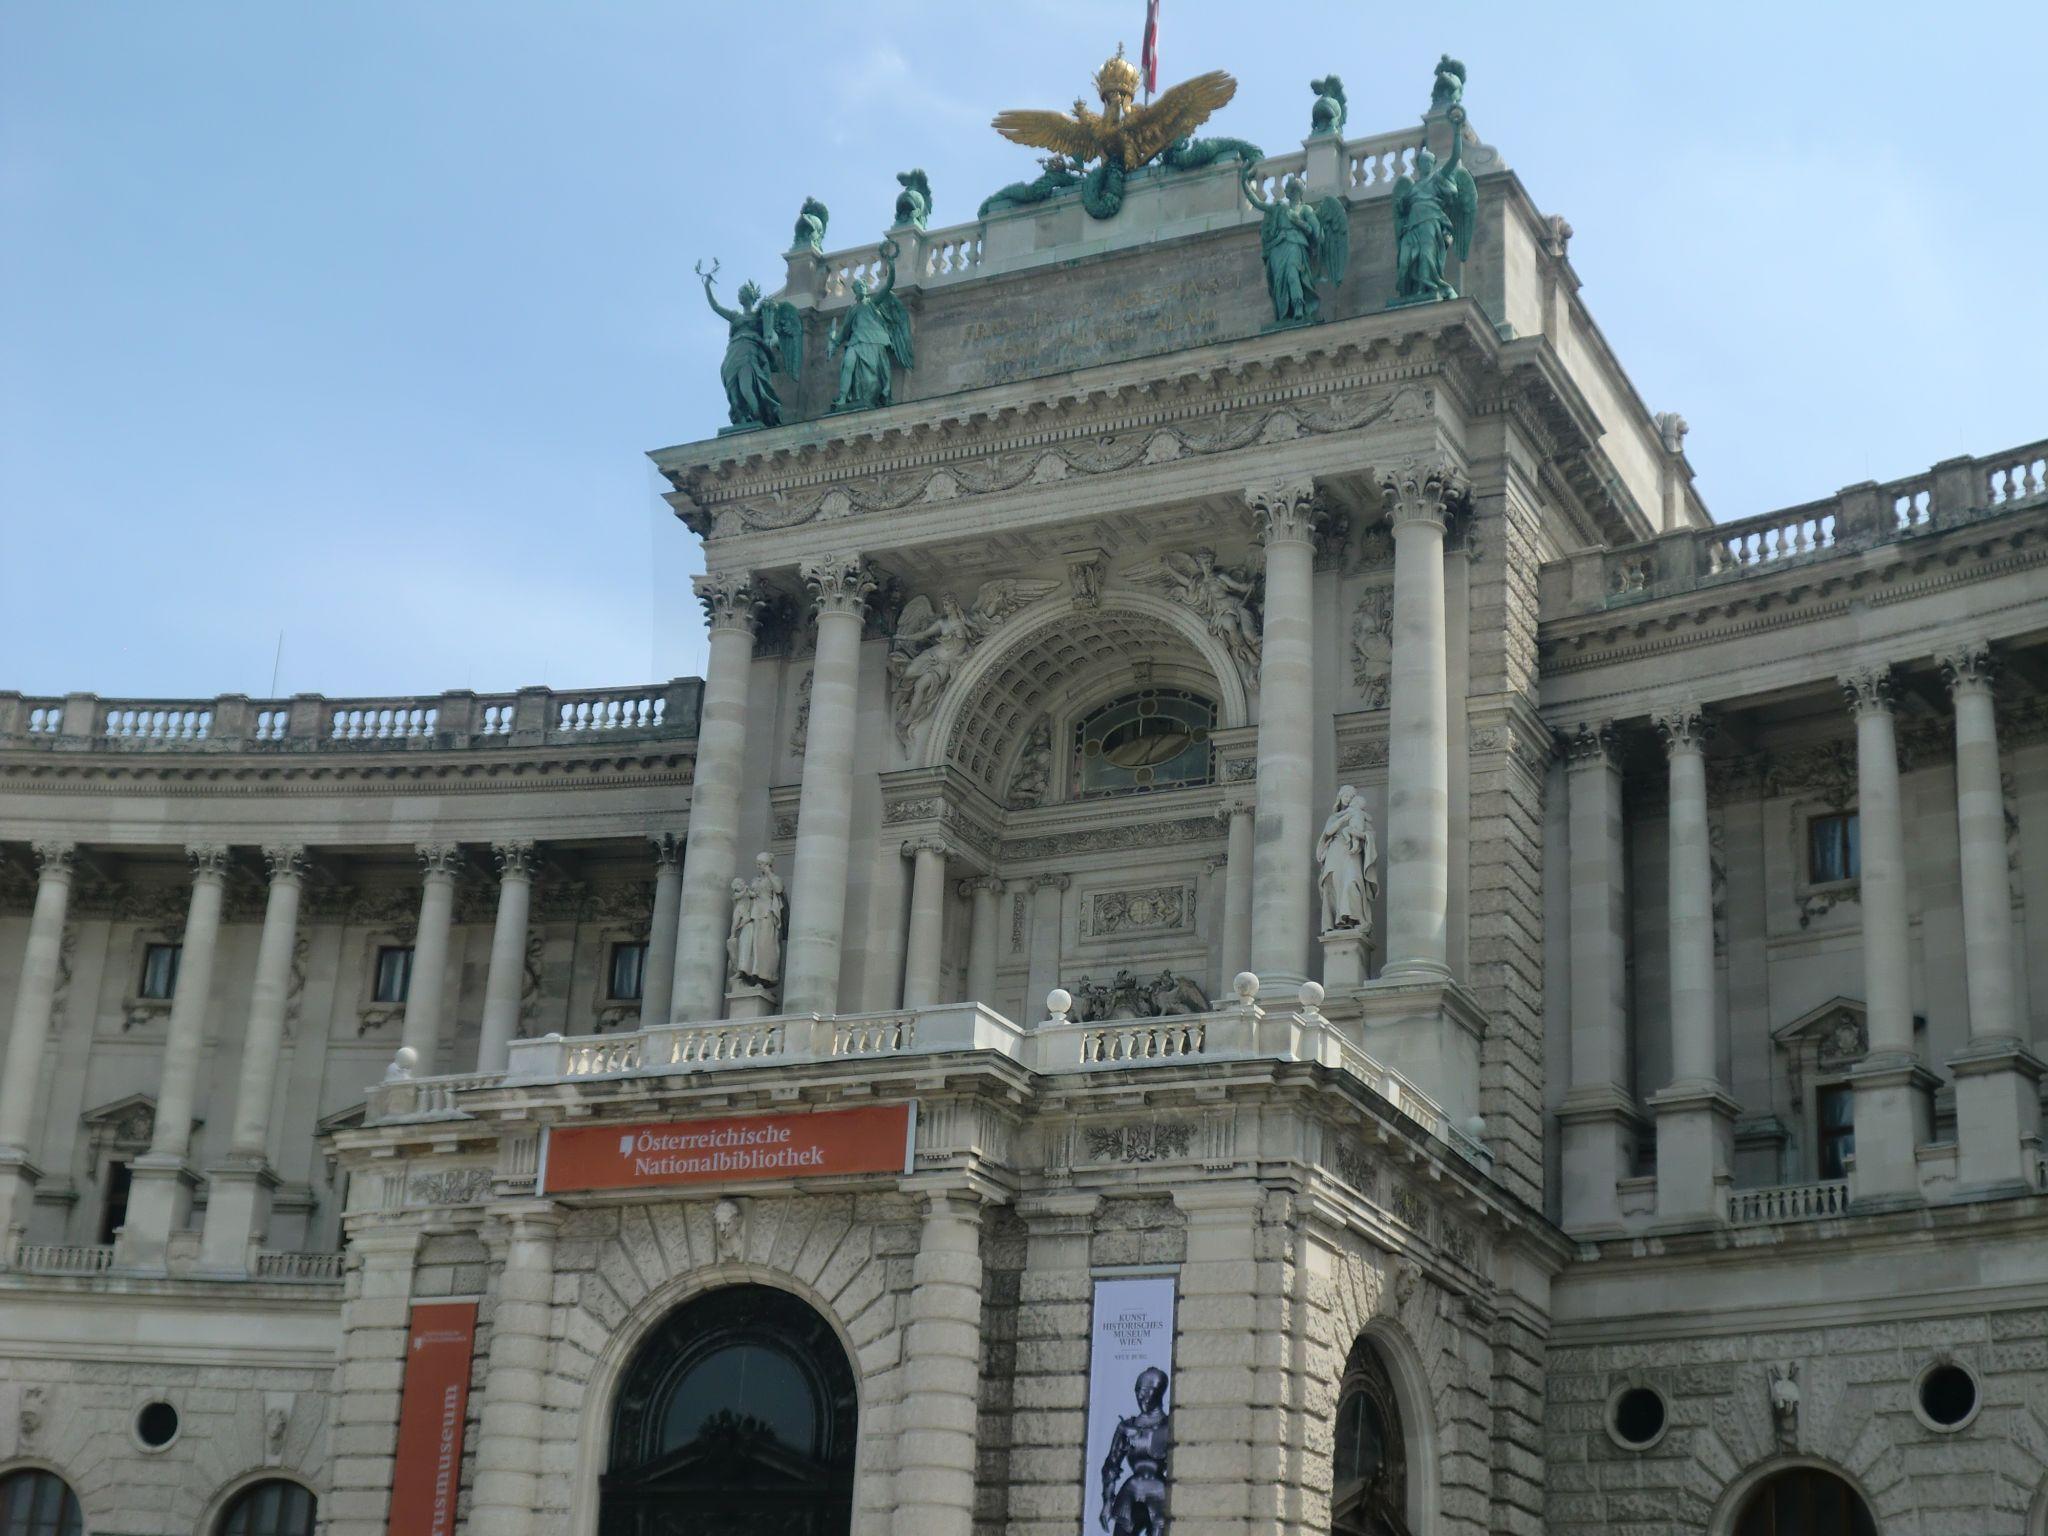 Vienna Hofburg 24 1440x1080 - Vienna: elegant beauty